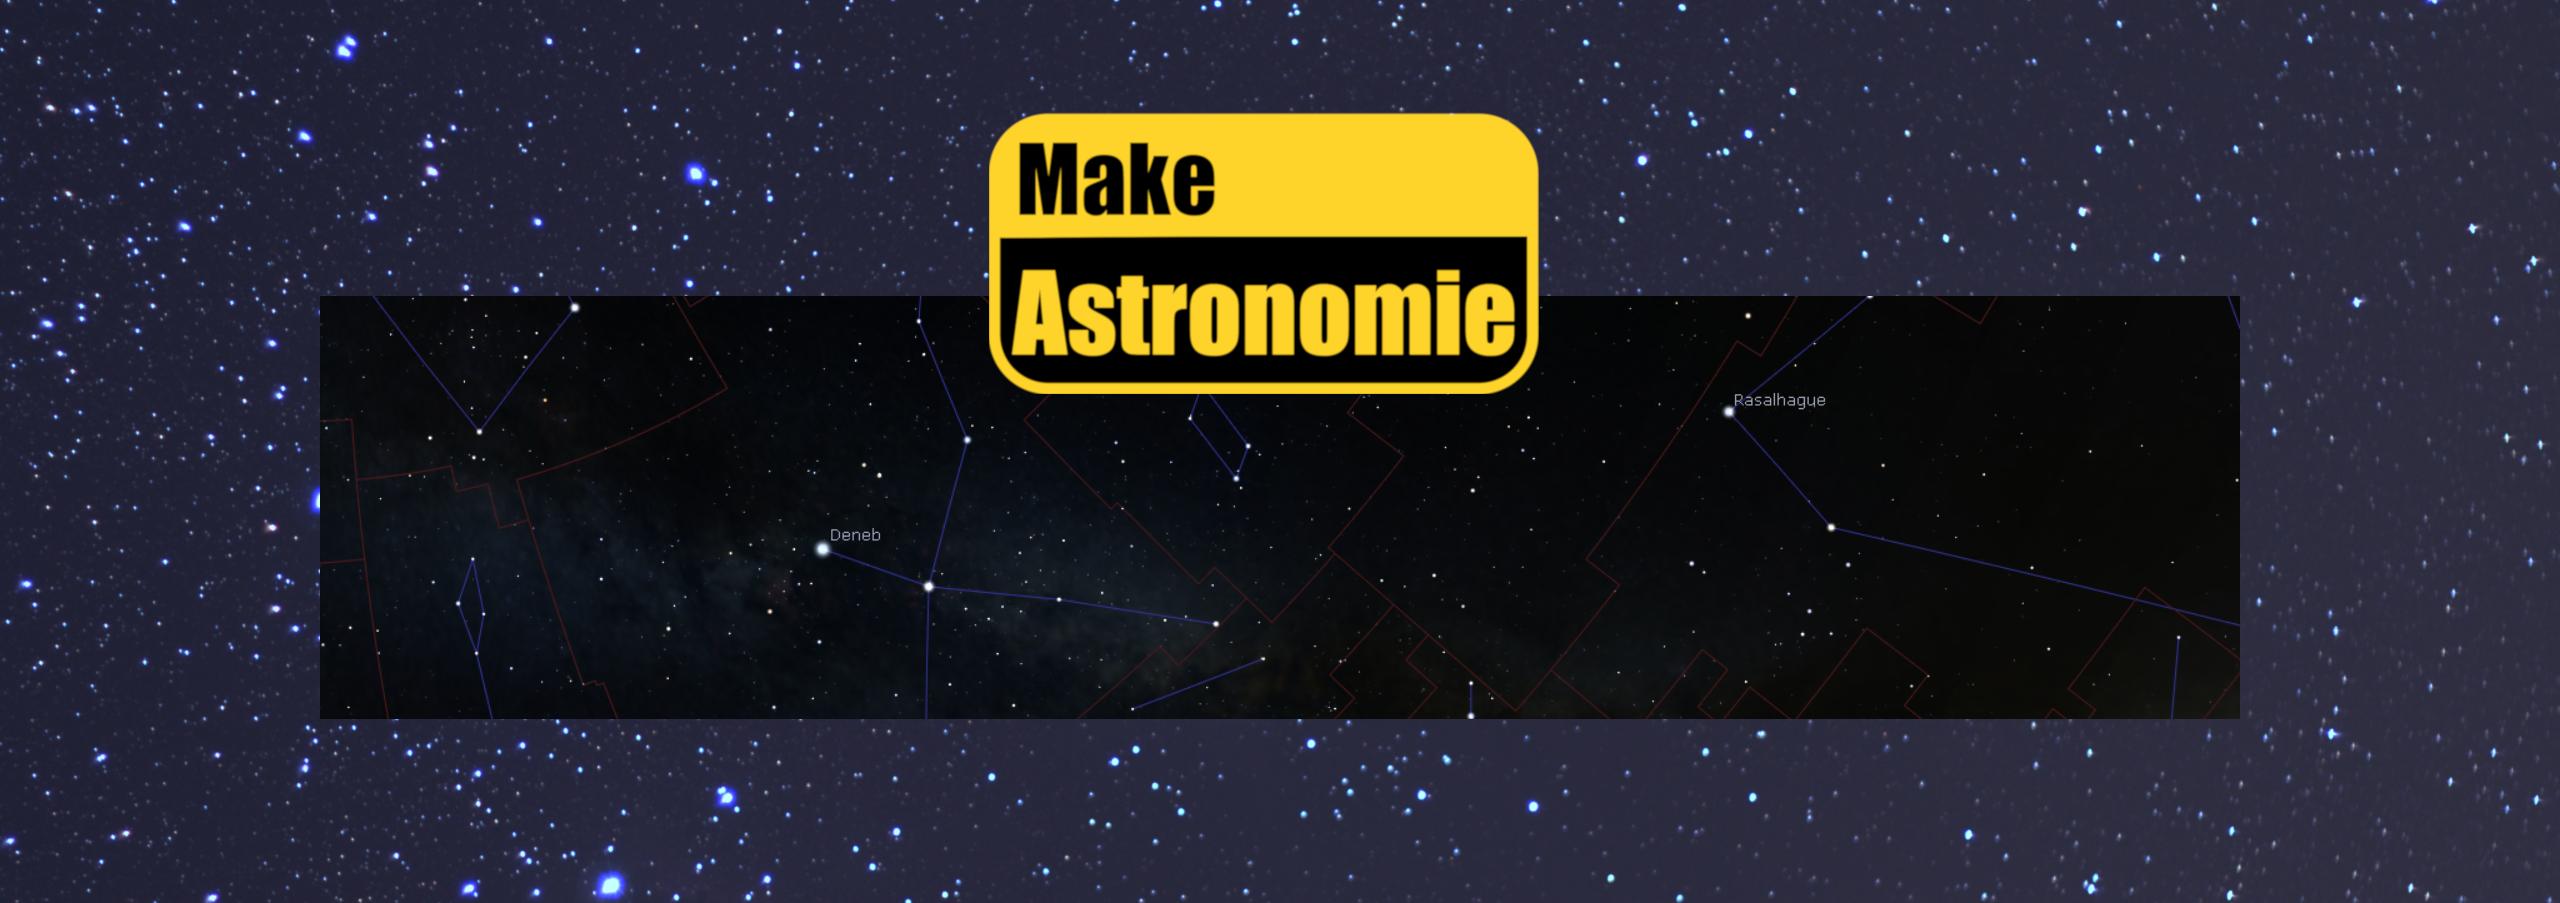 Make-Astronomie